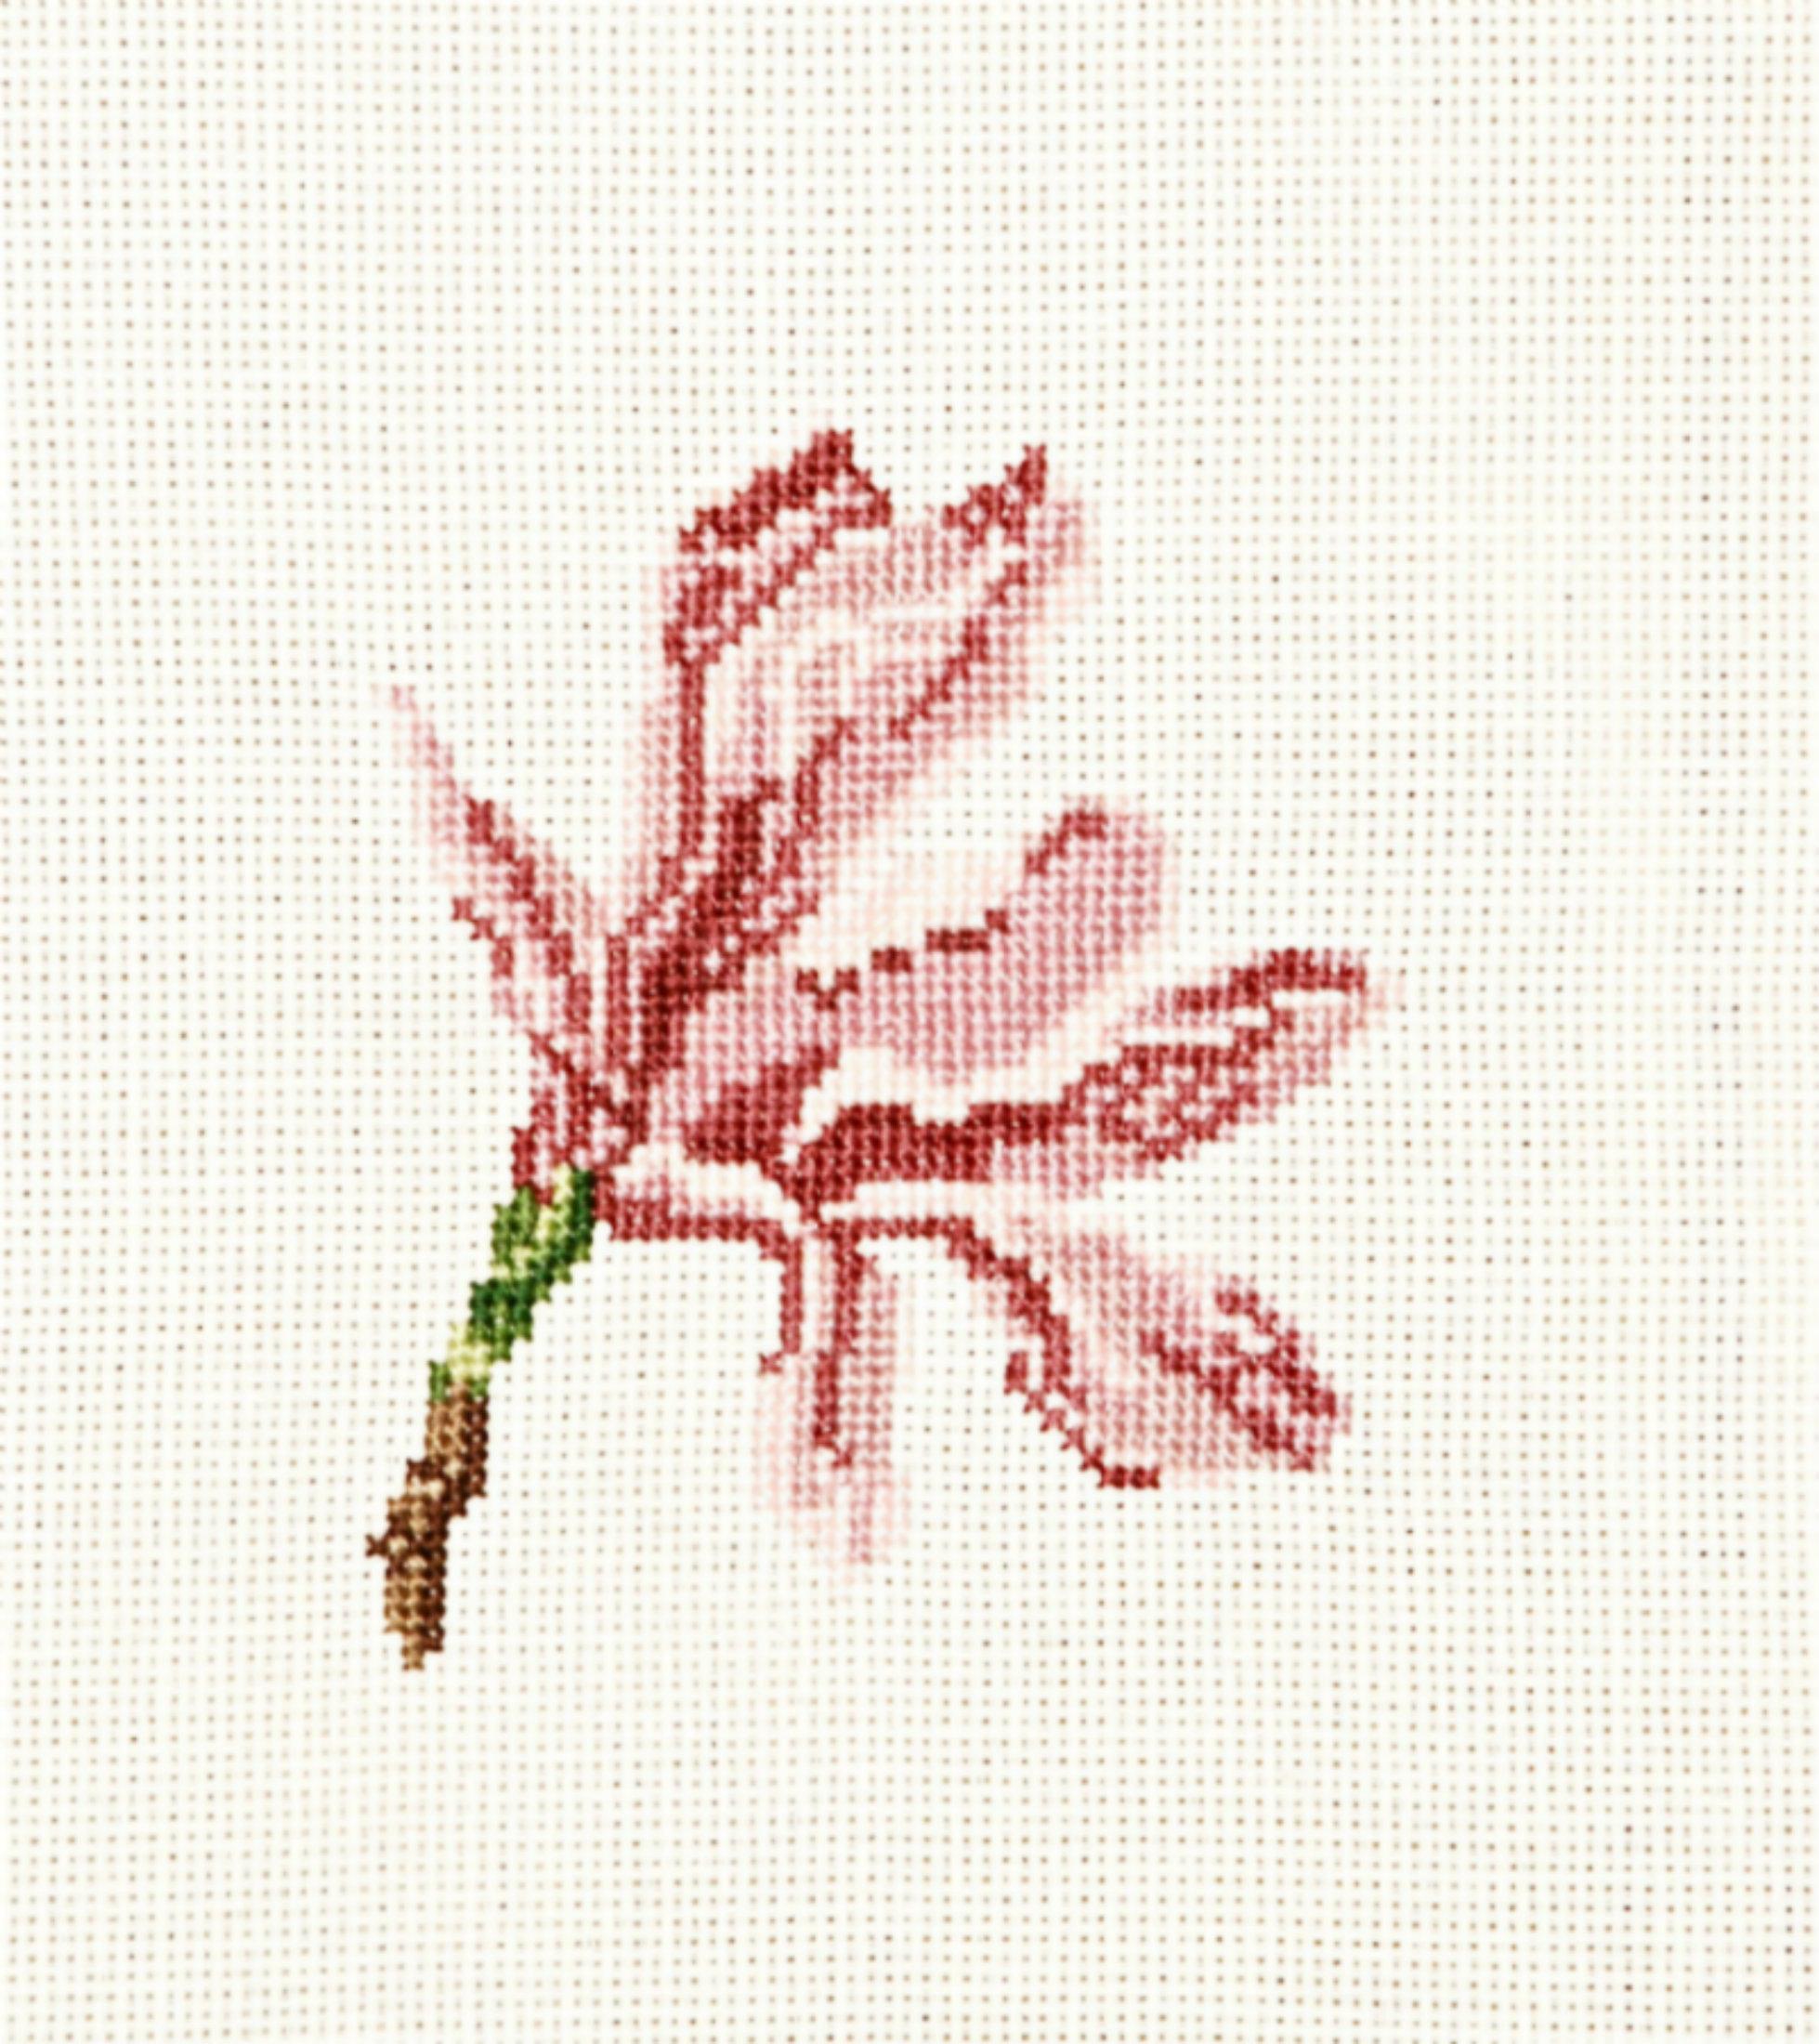 Magnolia flower head cross stitch kit completed